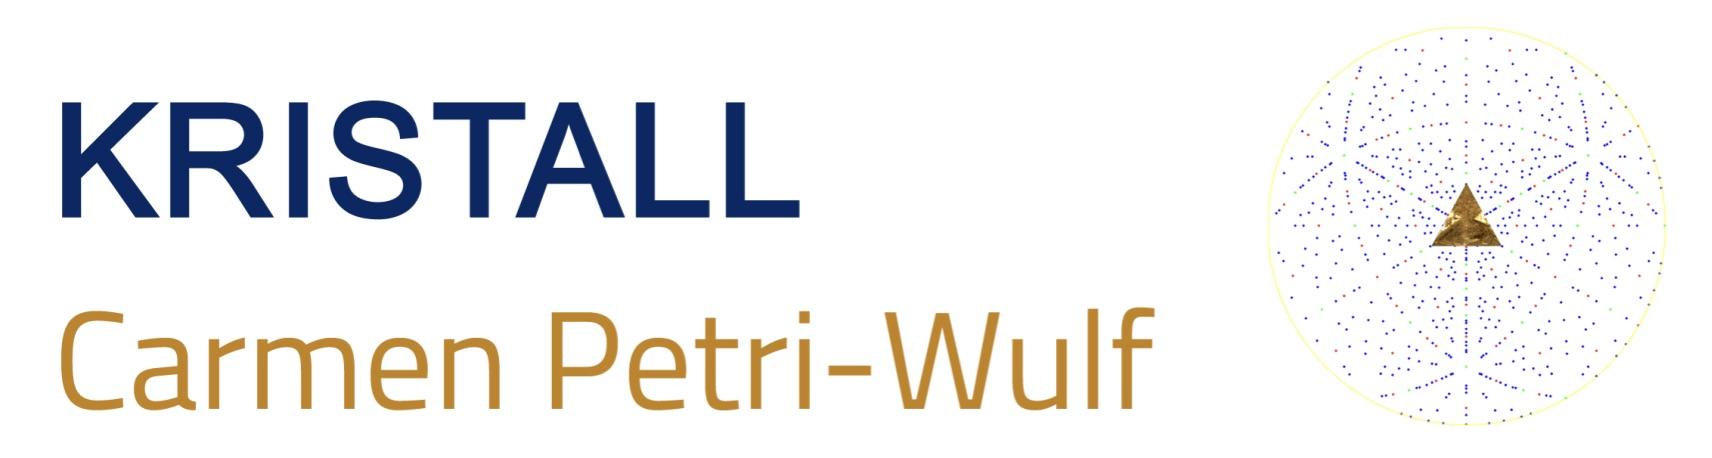 KRISTALL Carmen Petri-Wulf